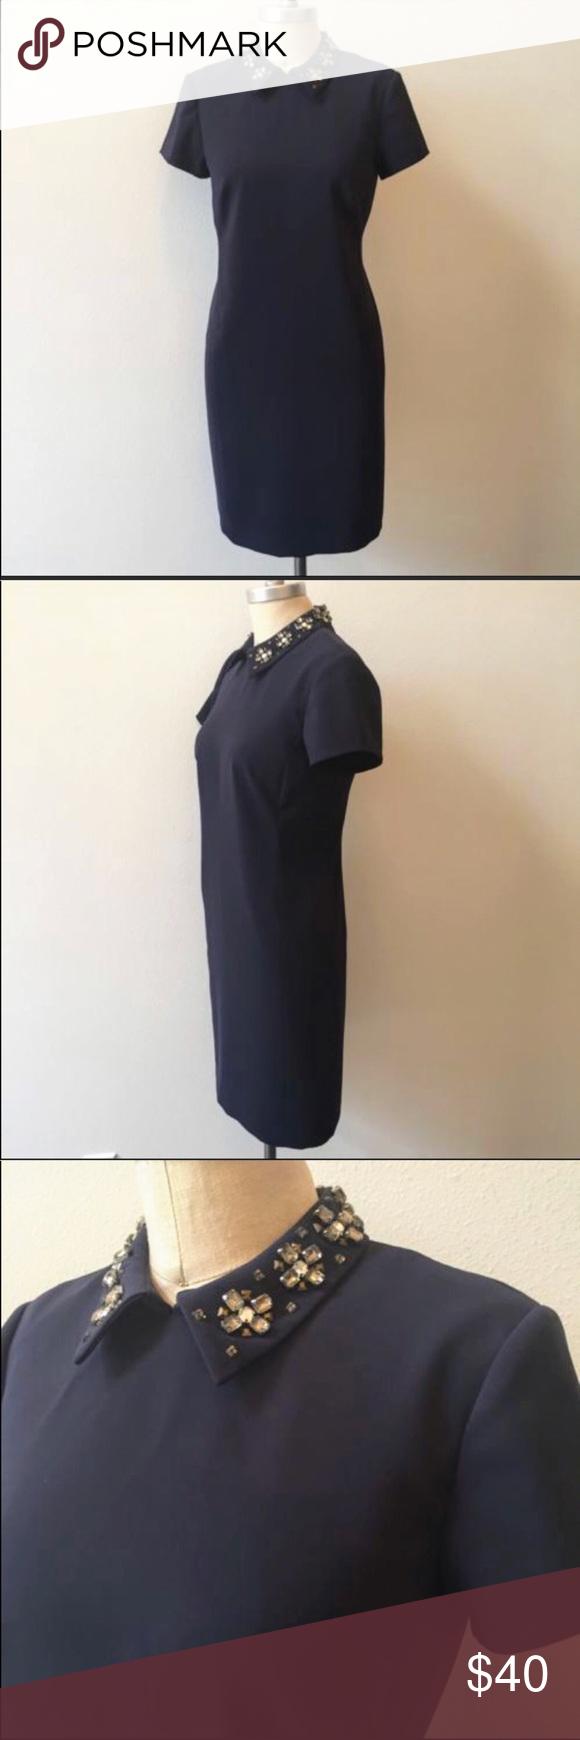 Anne taylor midi navy blue dress nwt